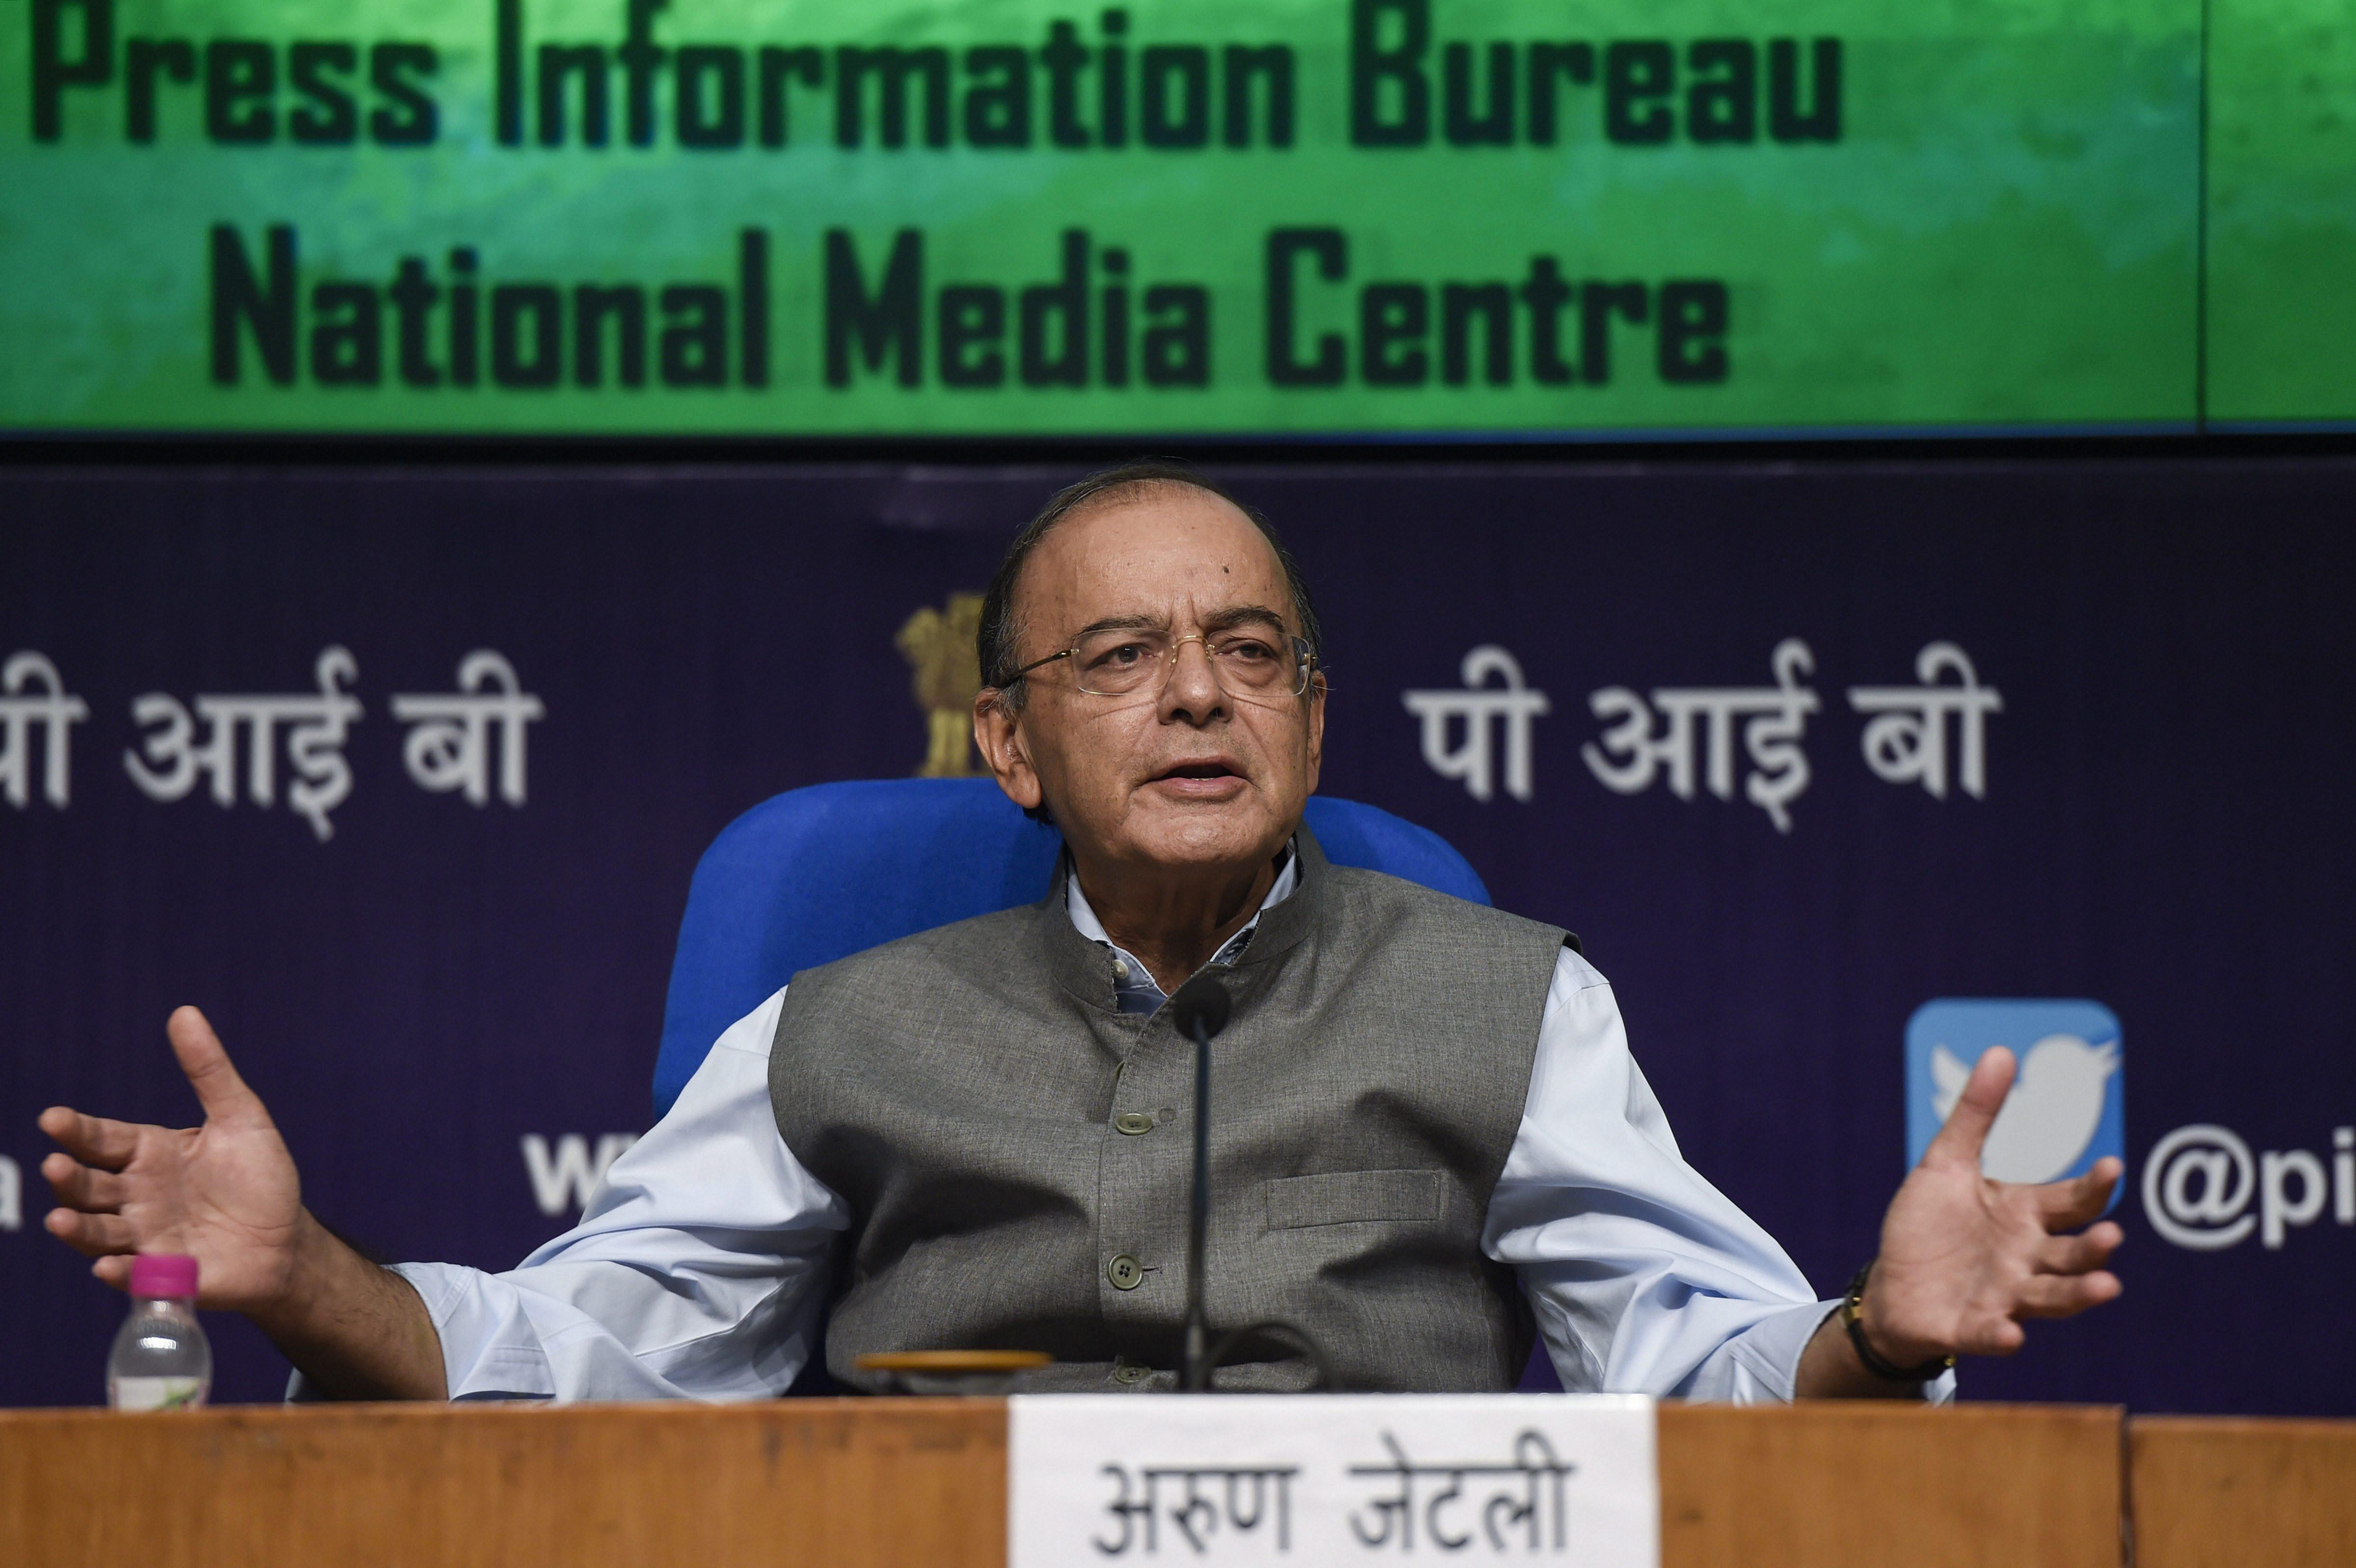 Congress blocked probe into anti-Sikh riots: BJP